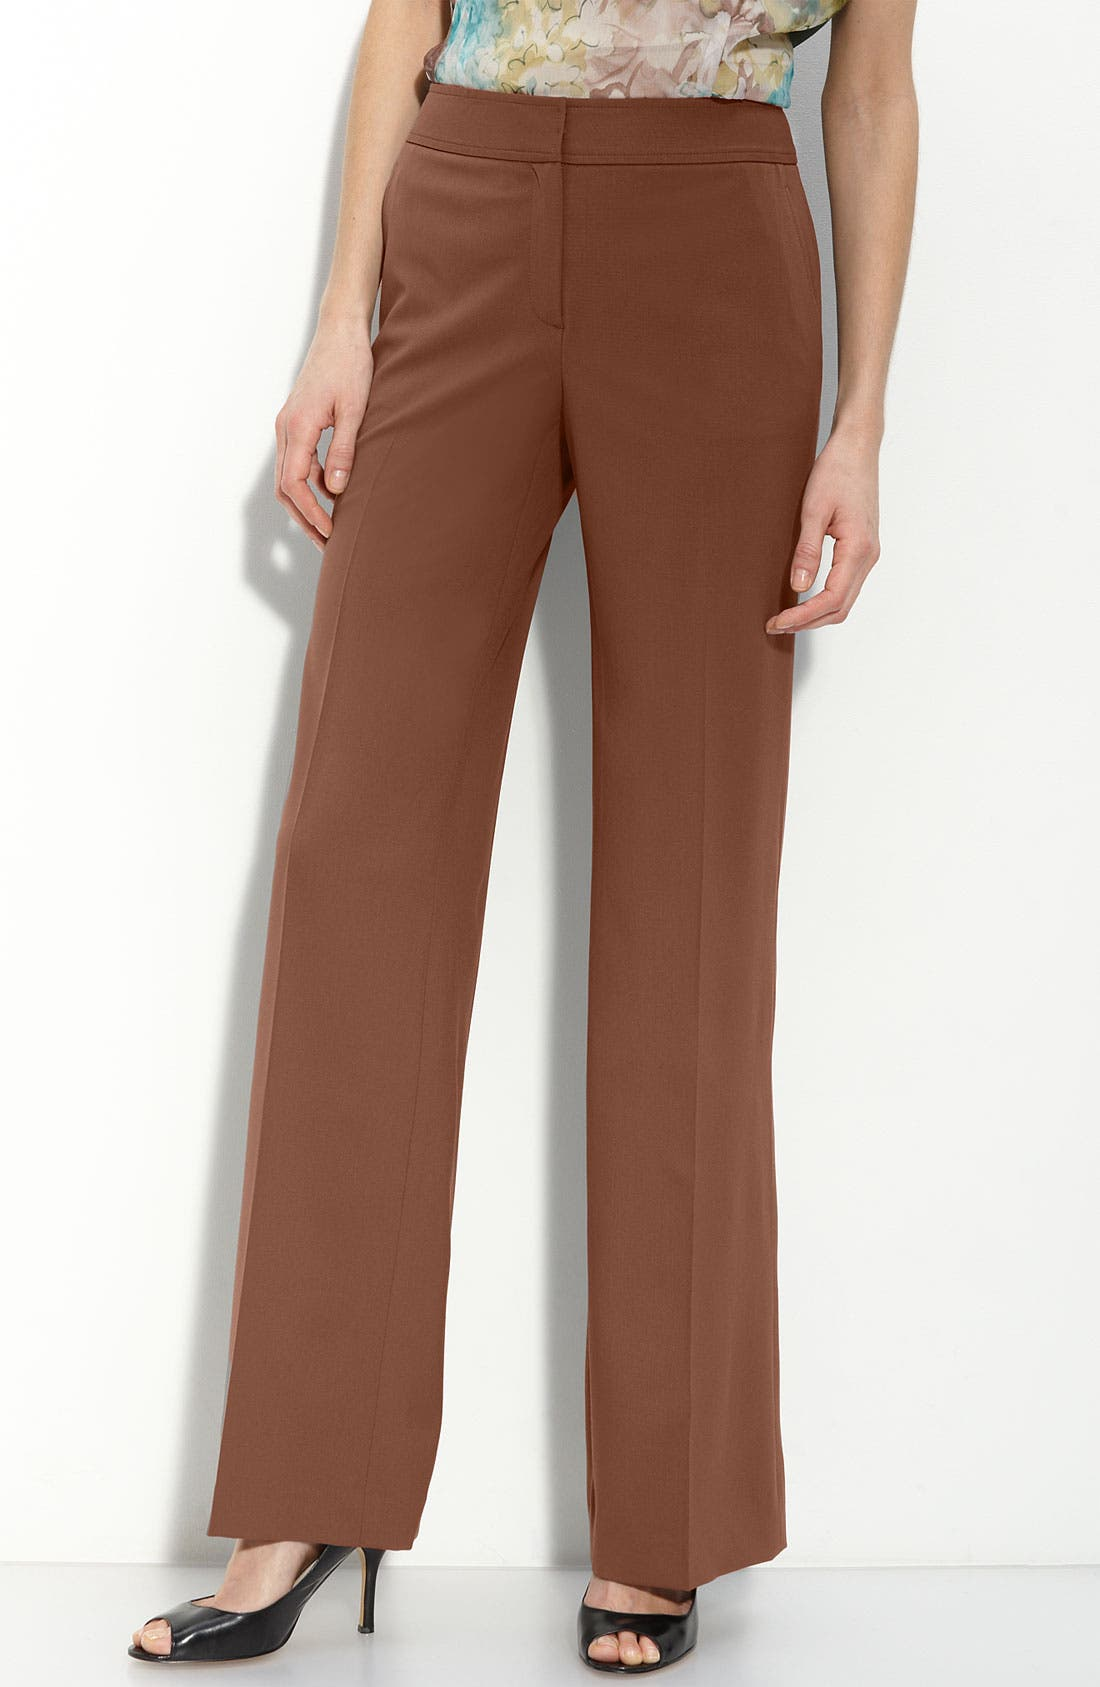 Main Image - Lafayette 148 New York 'Delancey' Stretch Wool Pants